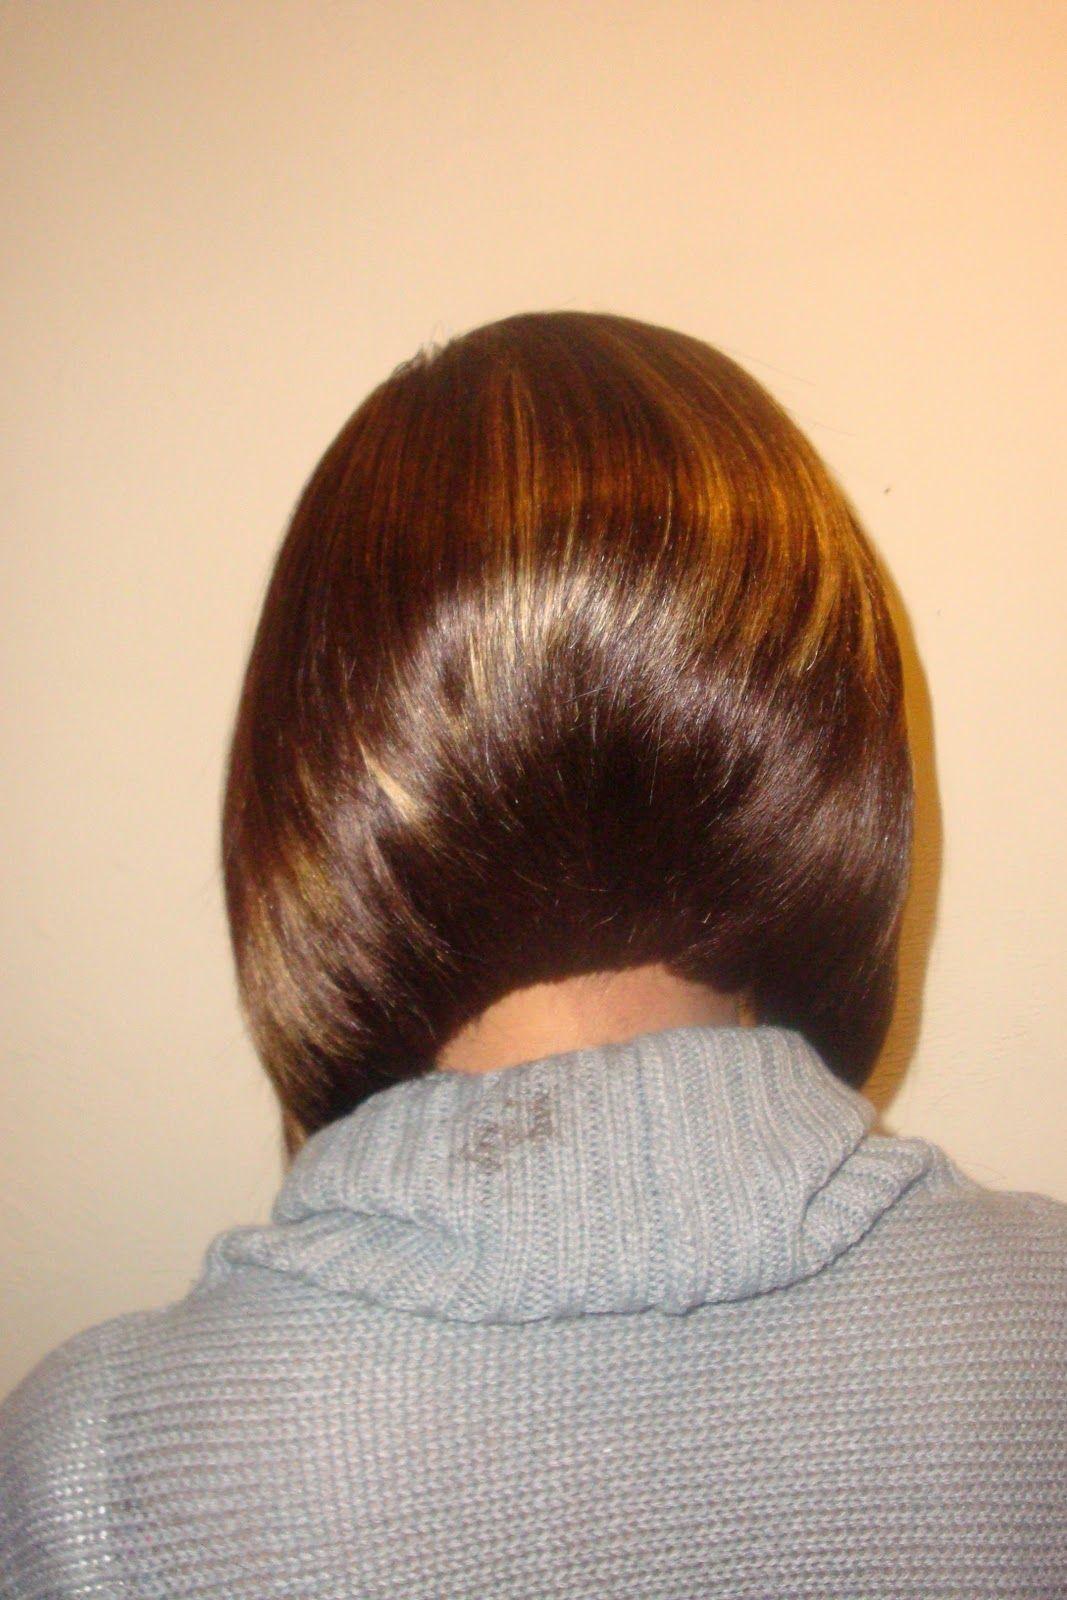 Pin By Yolanda Stellmacher On T Hair Apy Hair Styles Sew In Hairstyles Long Hair Styles